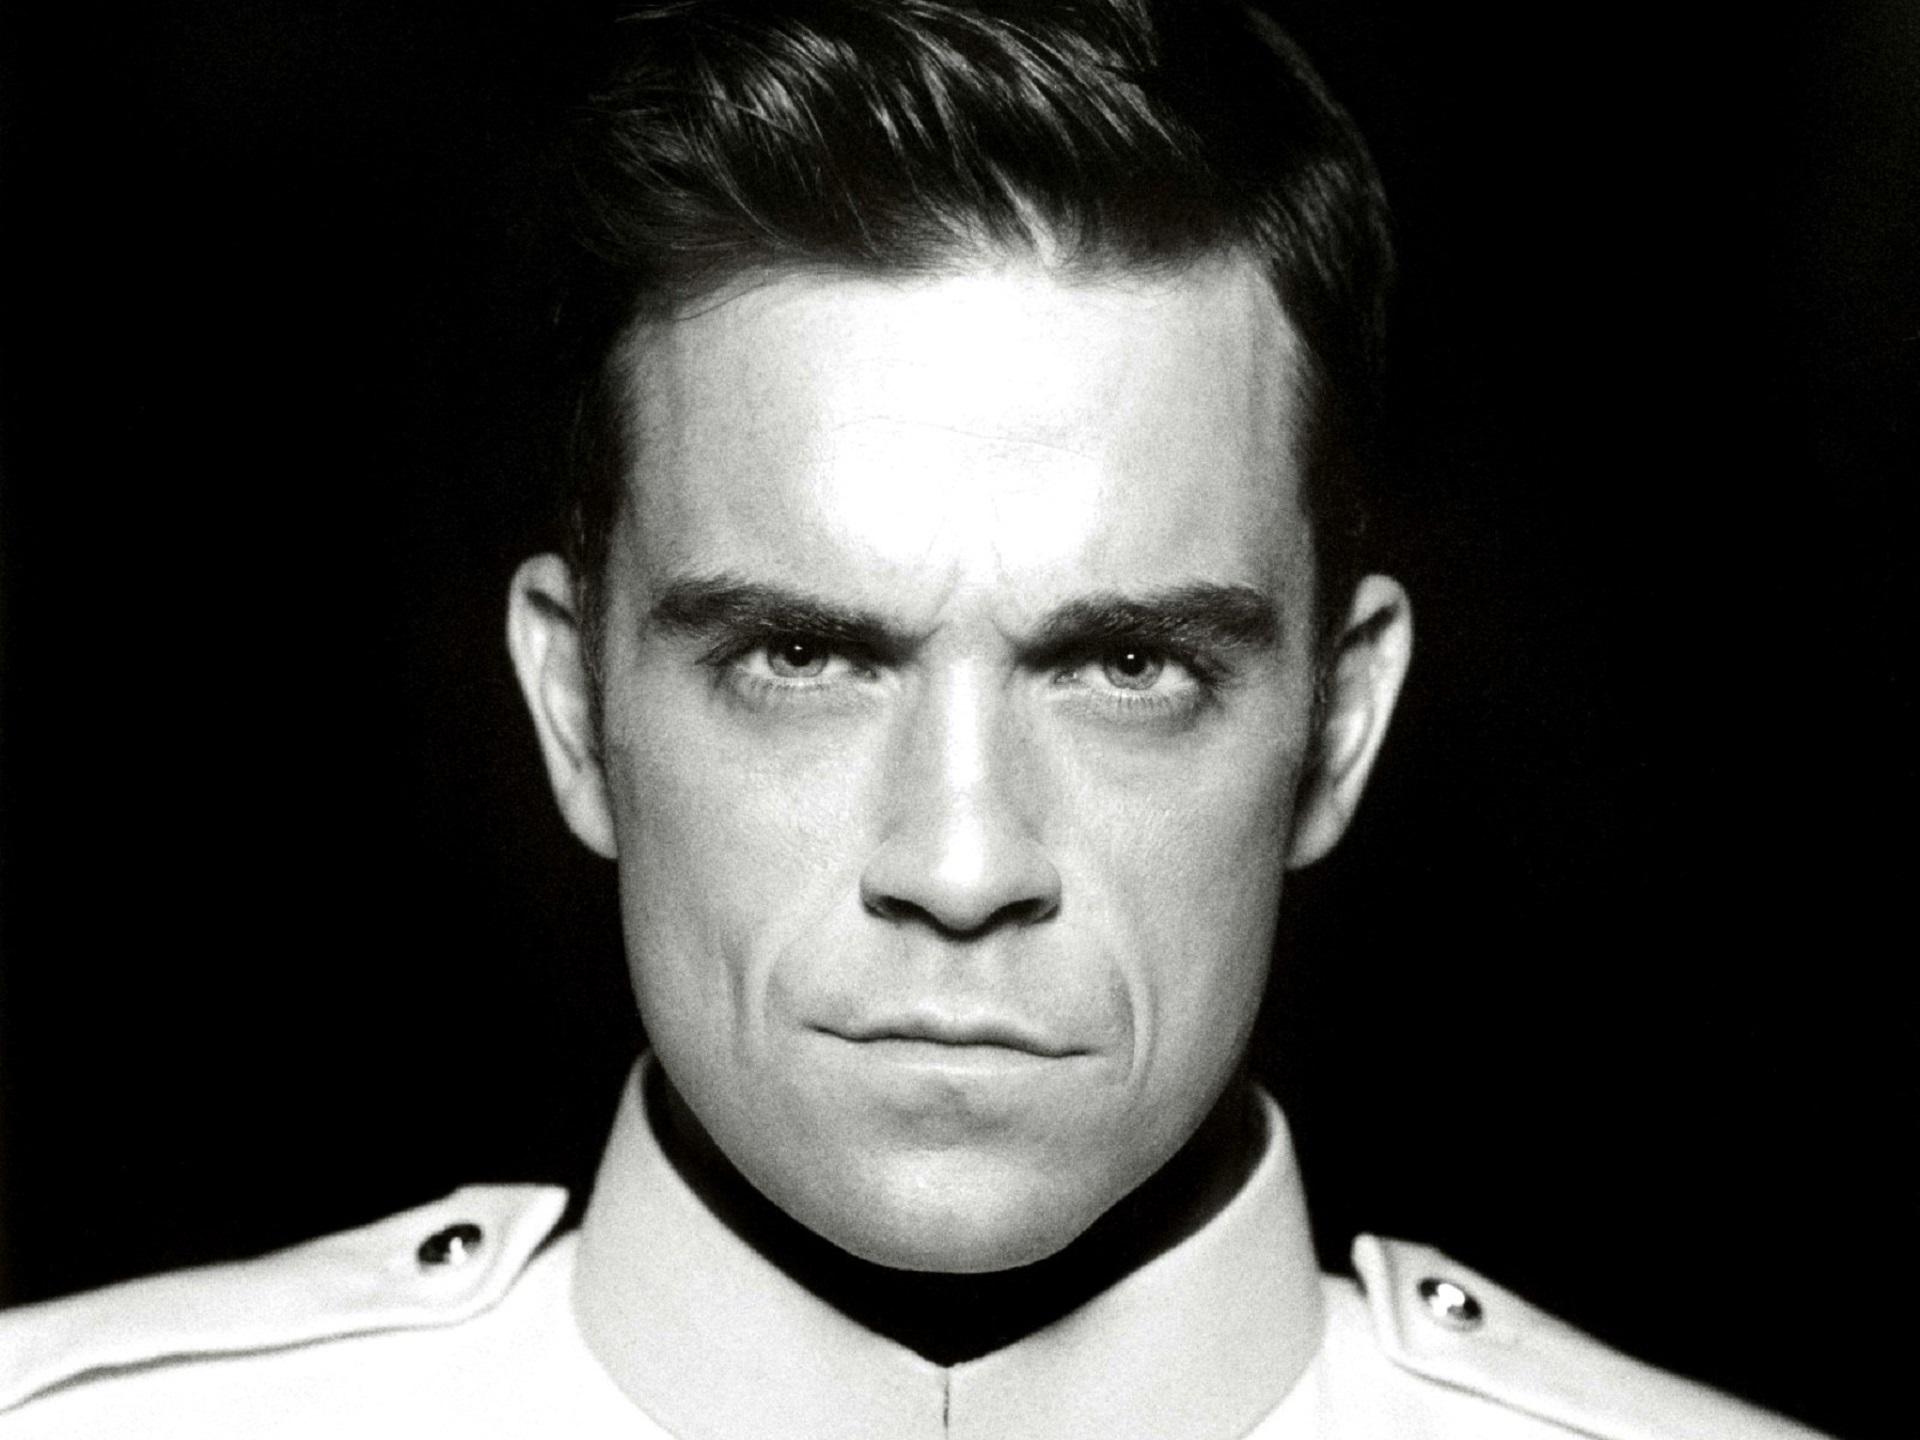 Robbie Williams Wallpaper